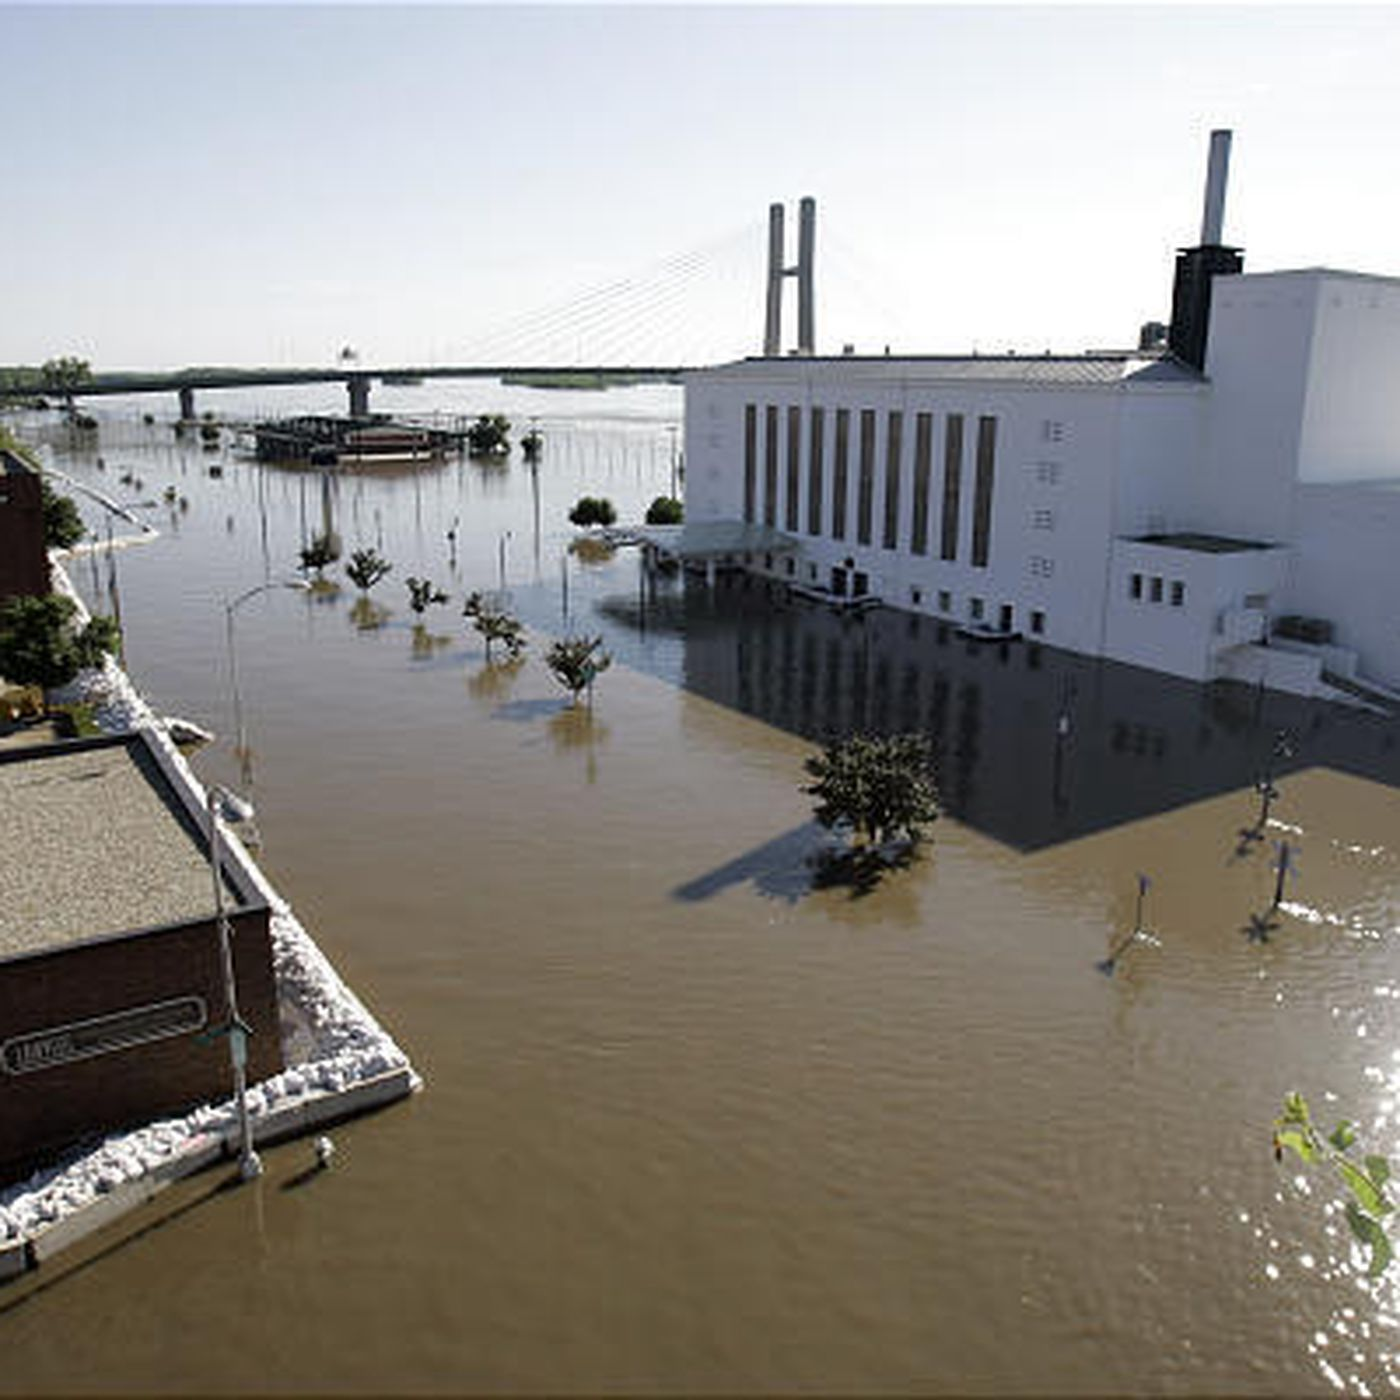 Mississippi River breaks through Illinois levee - Deseret News